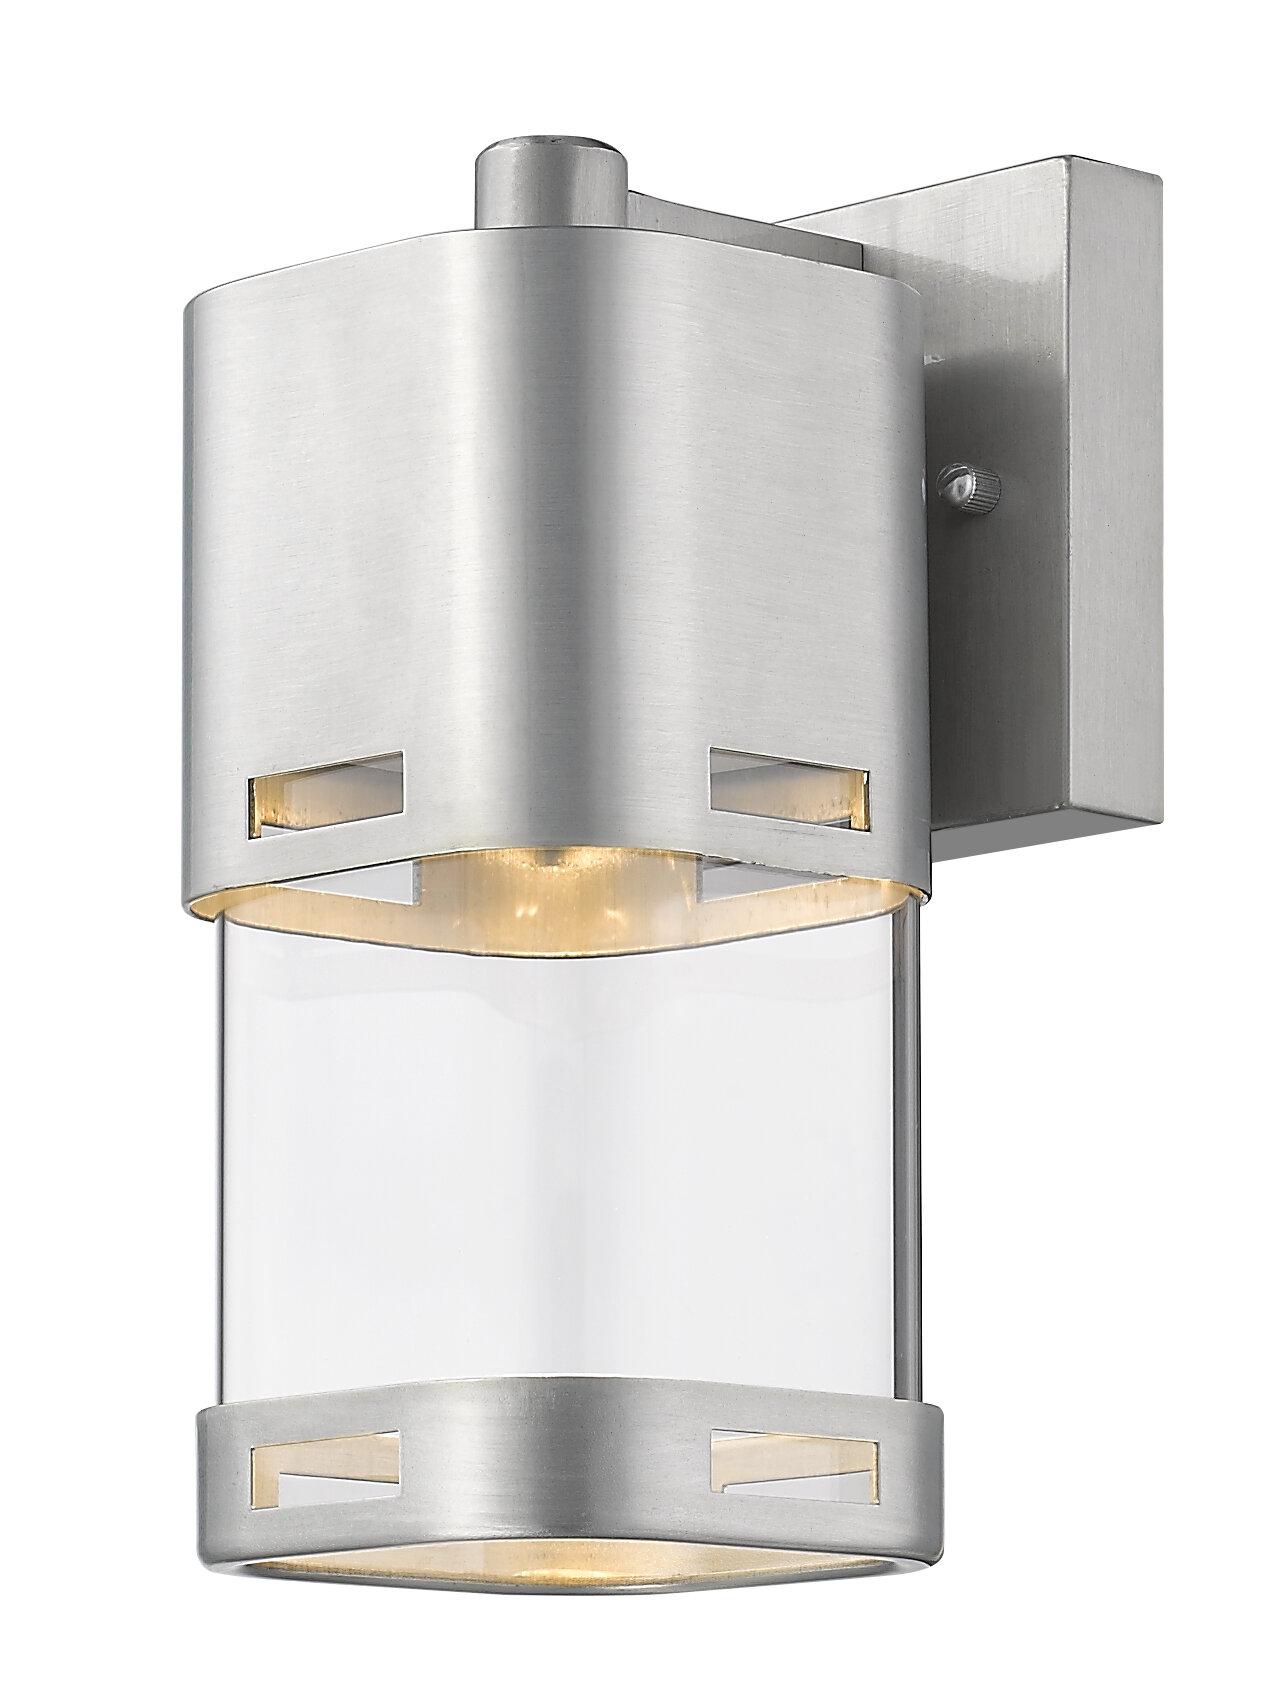 Room Essentials LED Outdoor Metal Lantern in Grey/'s Harbor